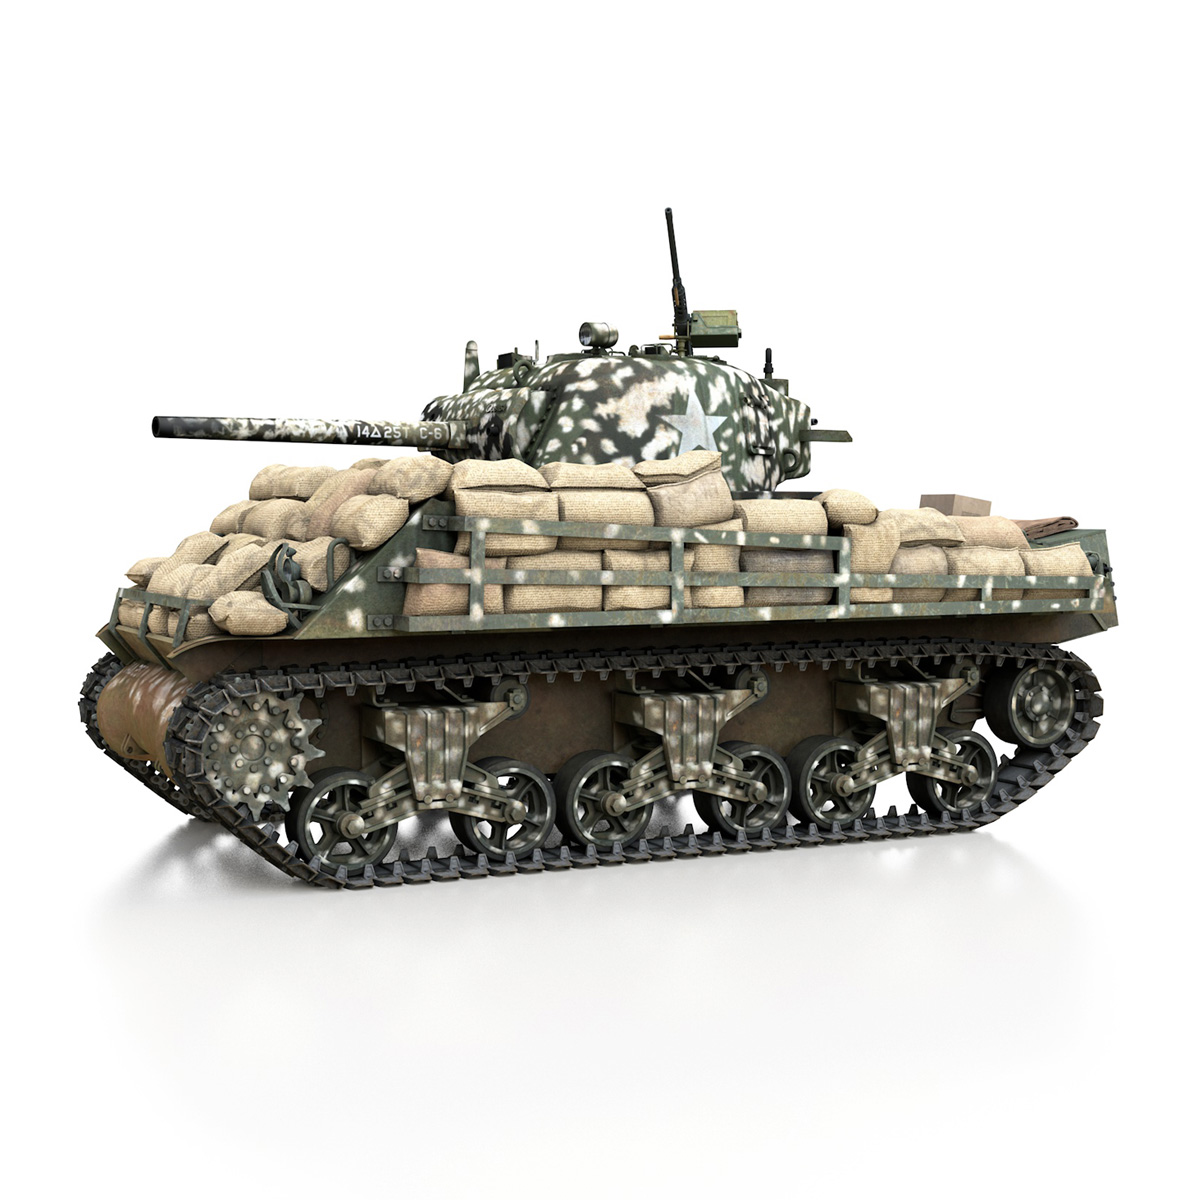 M4A3 (75) W Sherman - 25TB 3d model 3ds fbx c4d lwo lws lw obj 270676